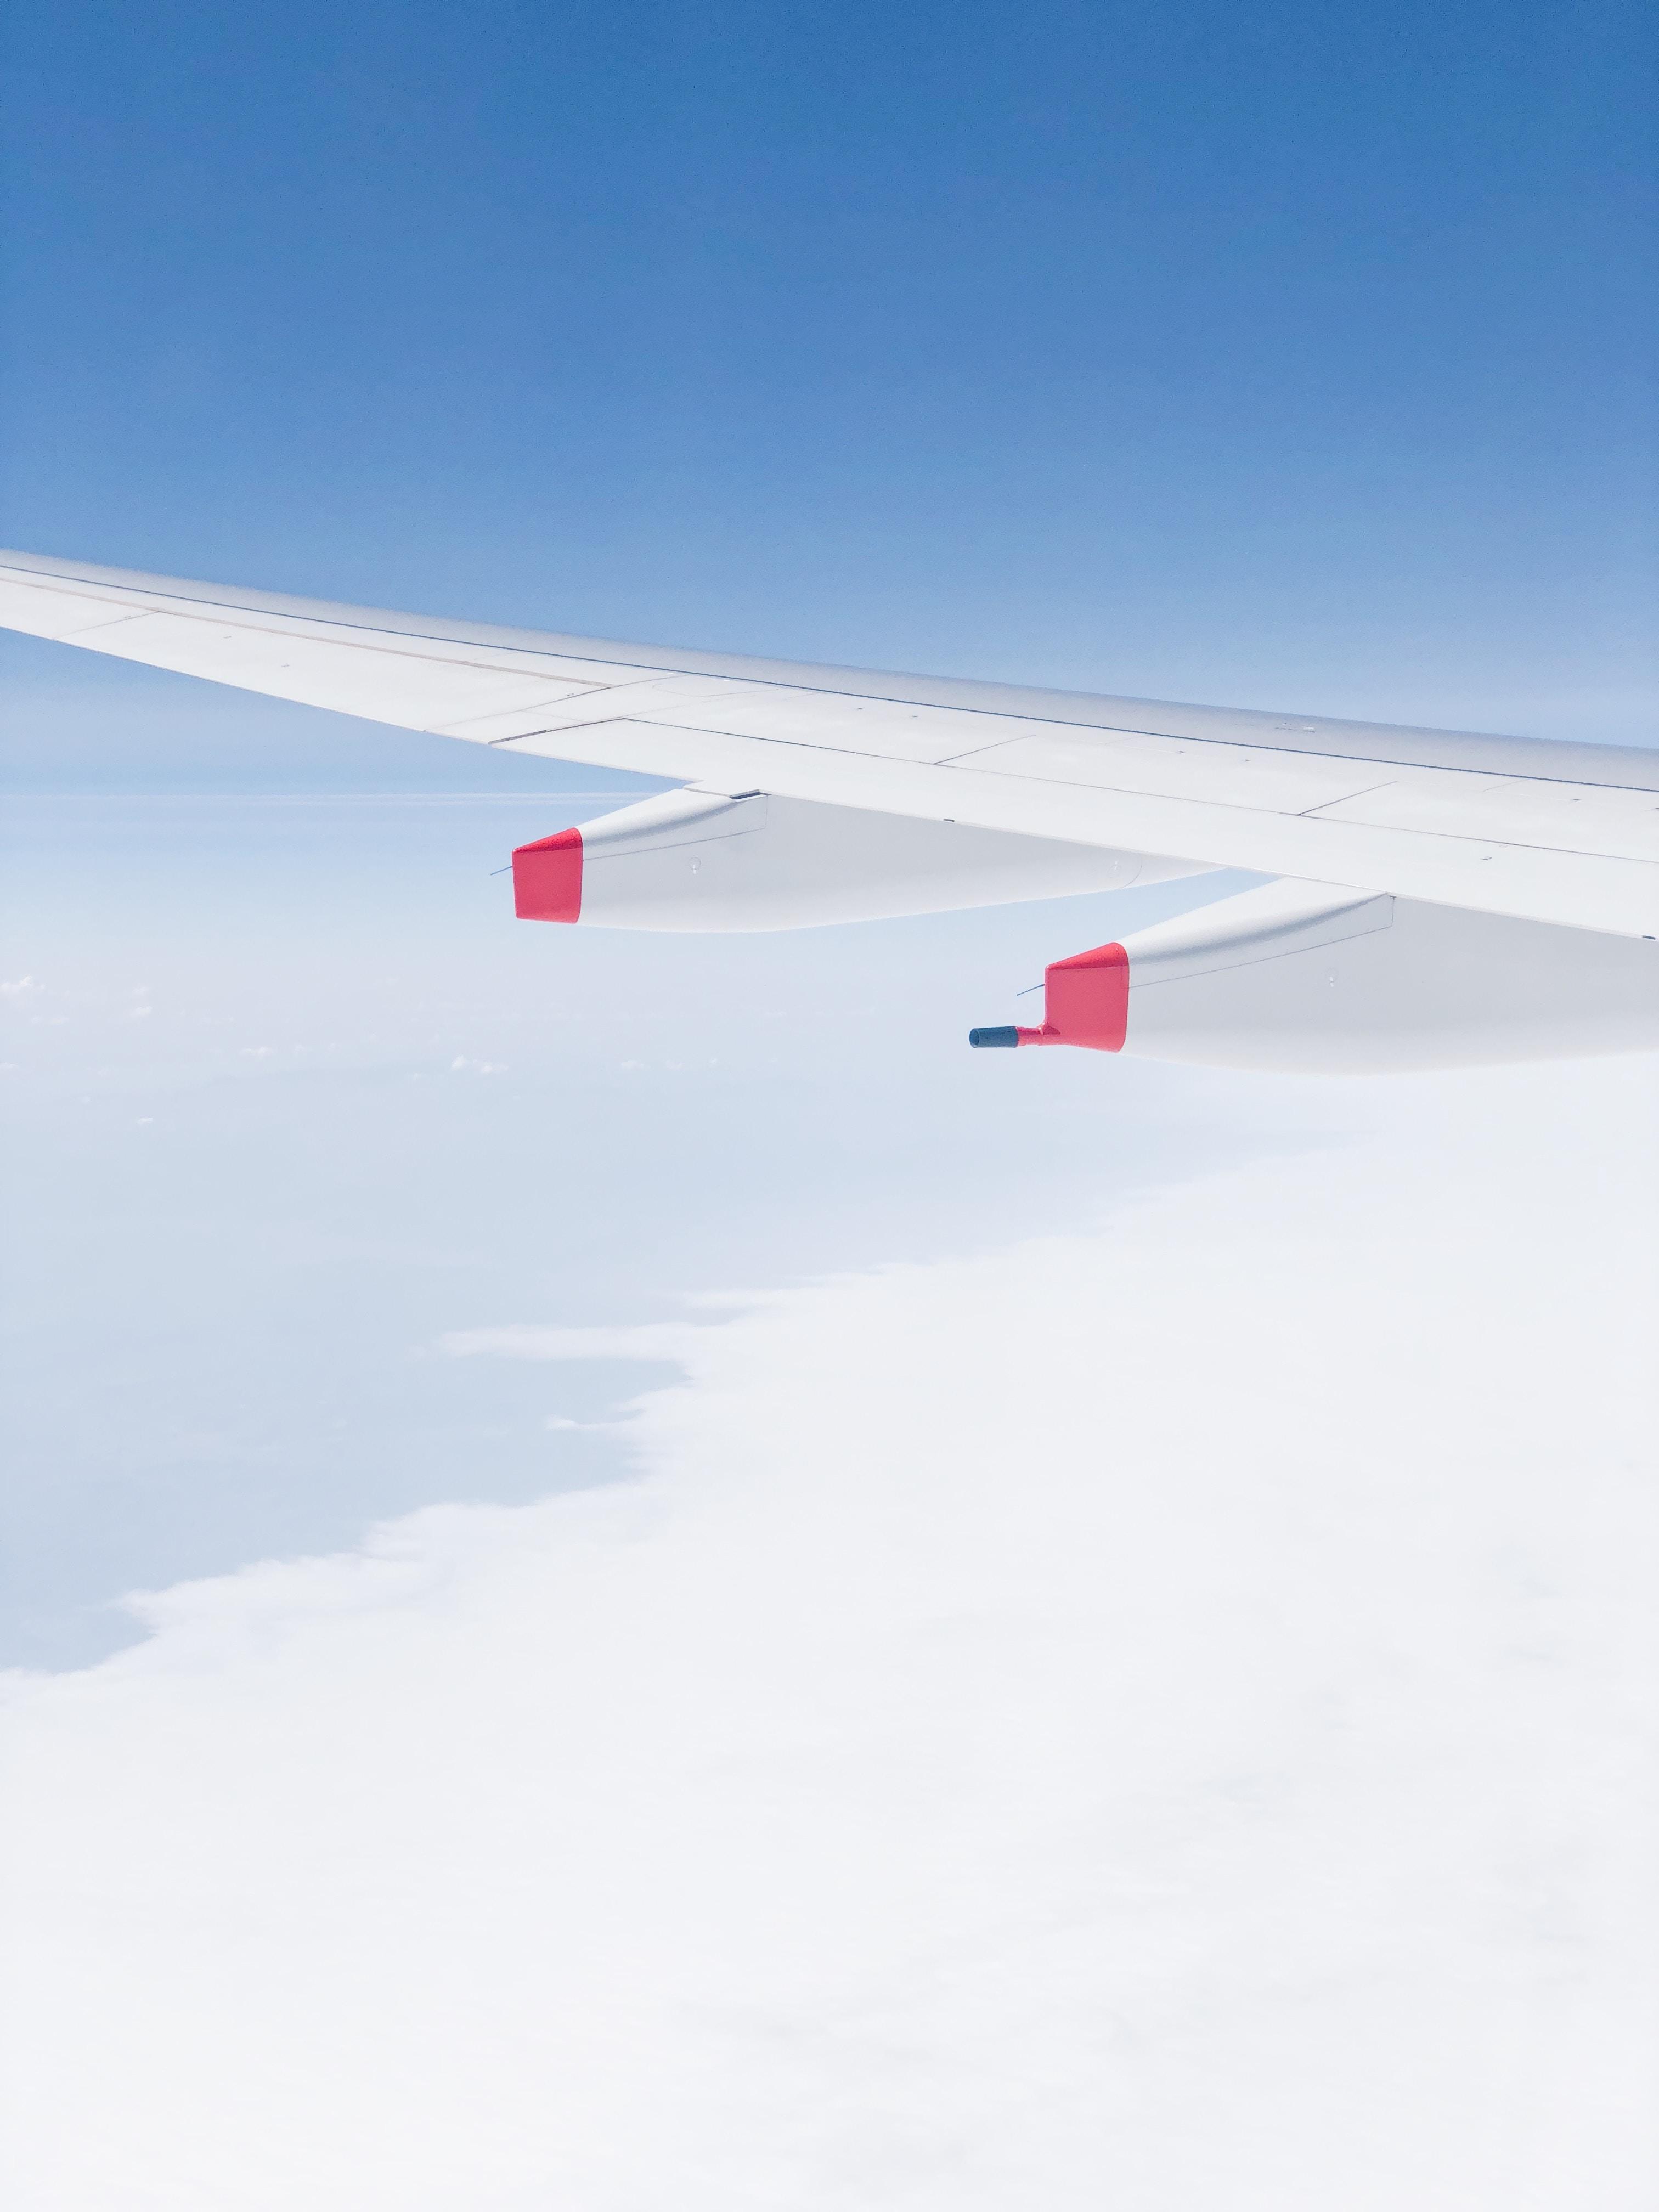 white airline